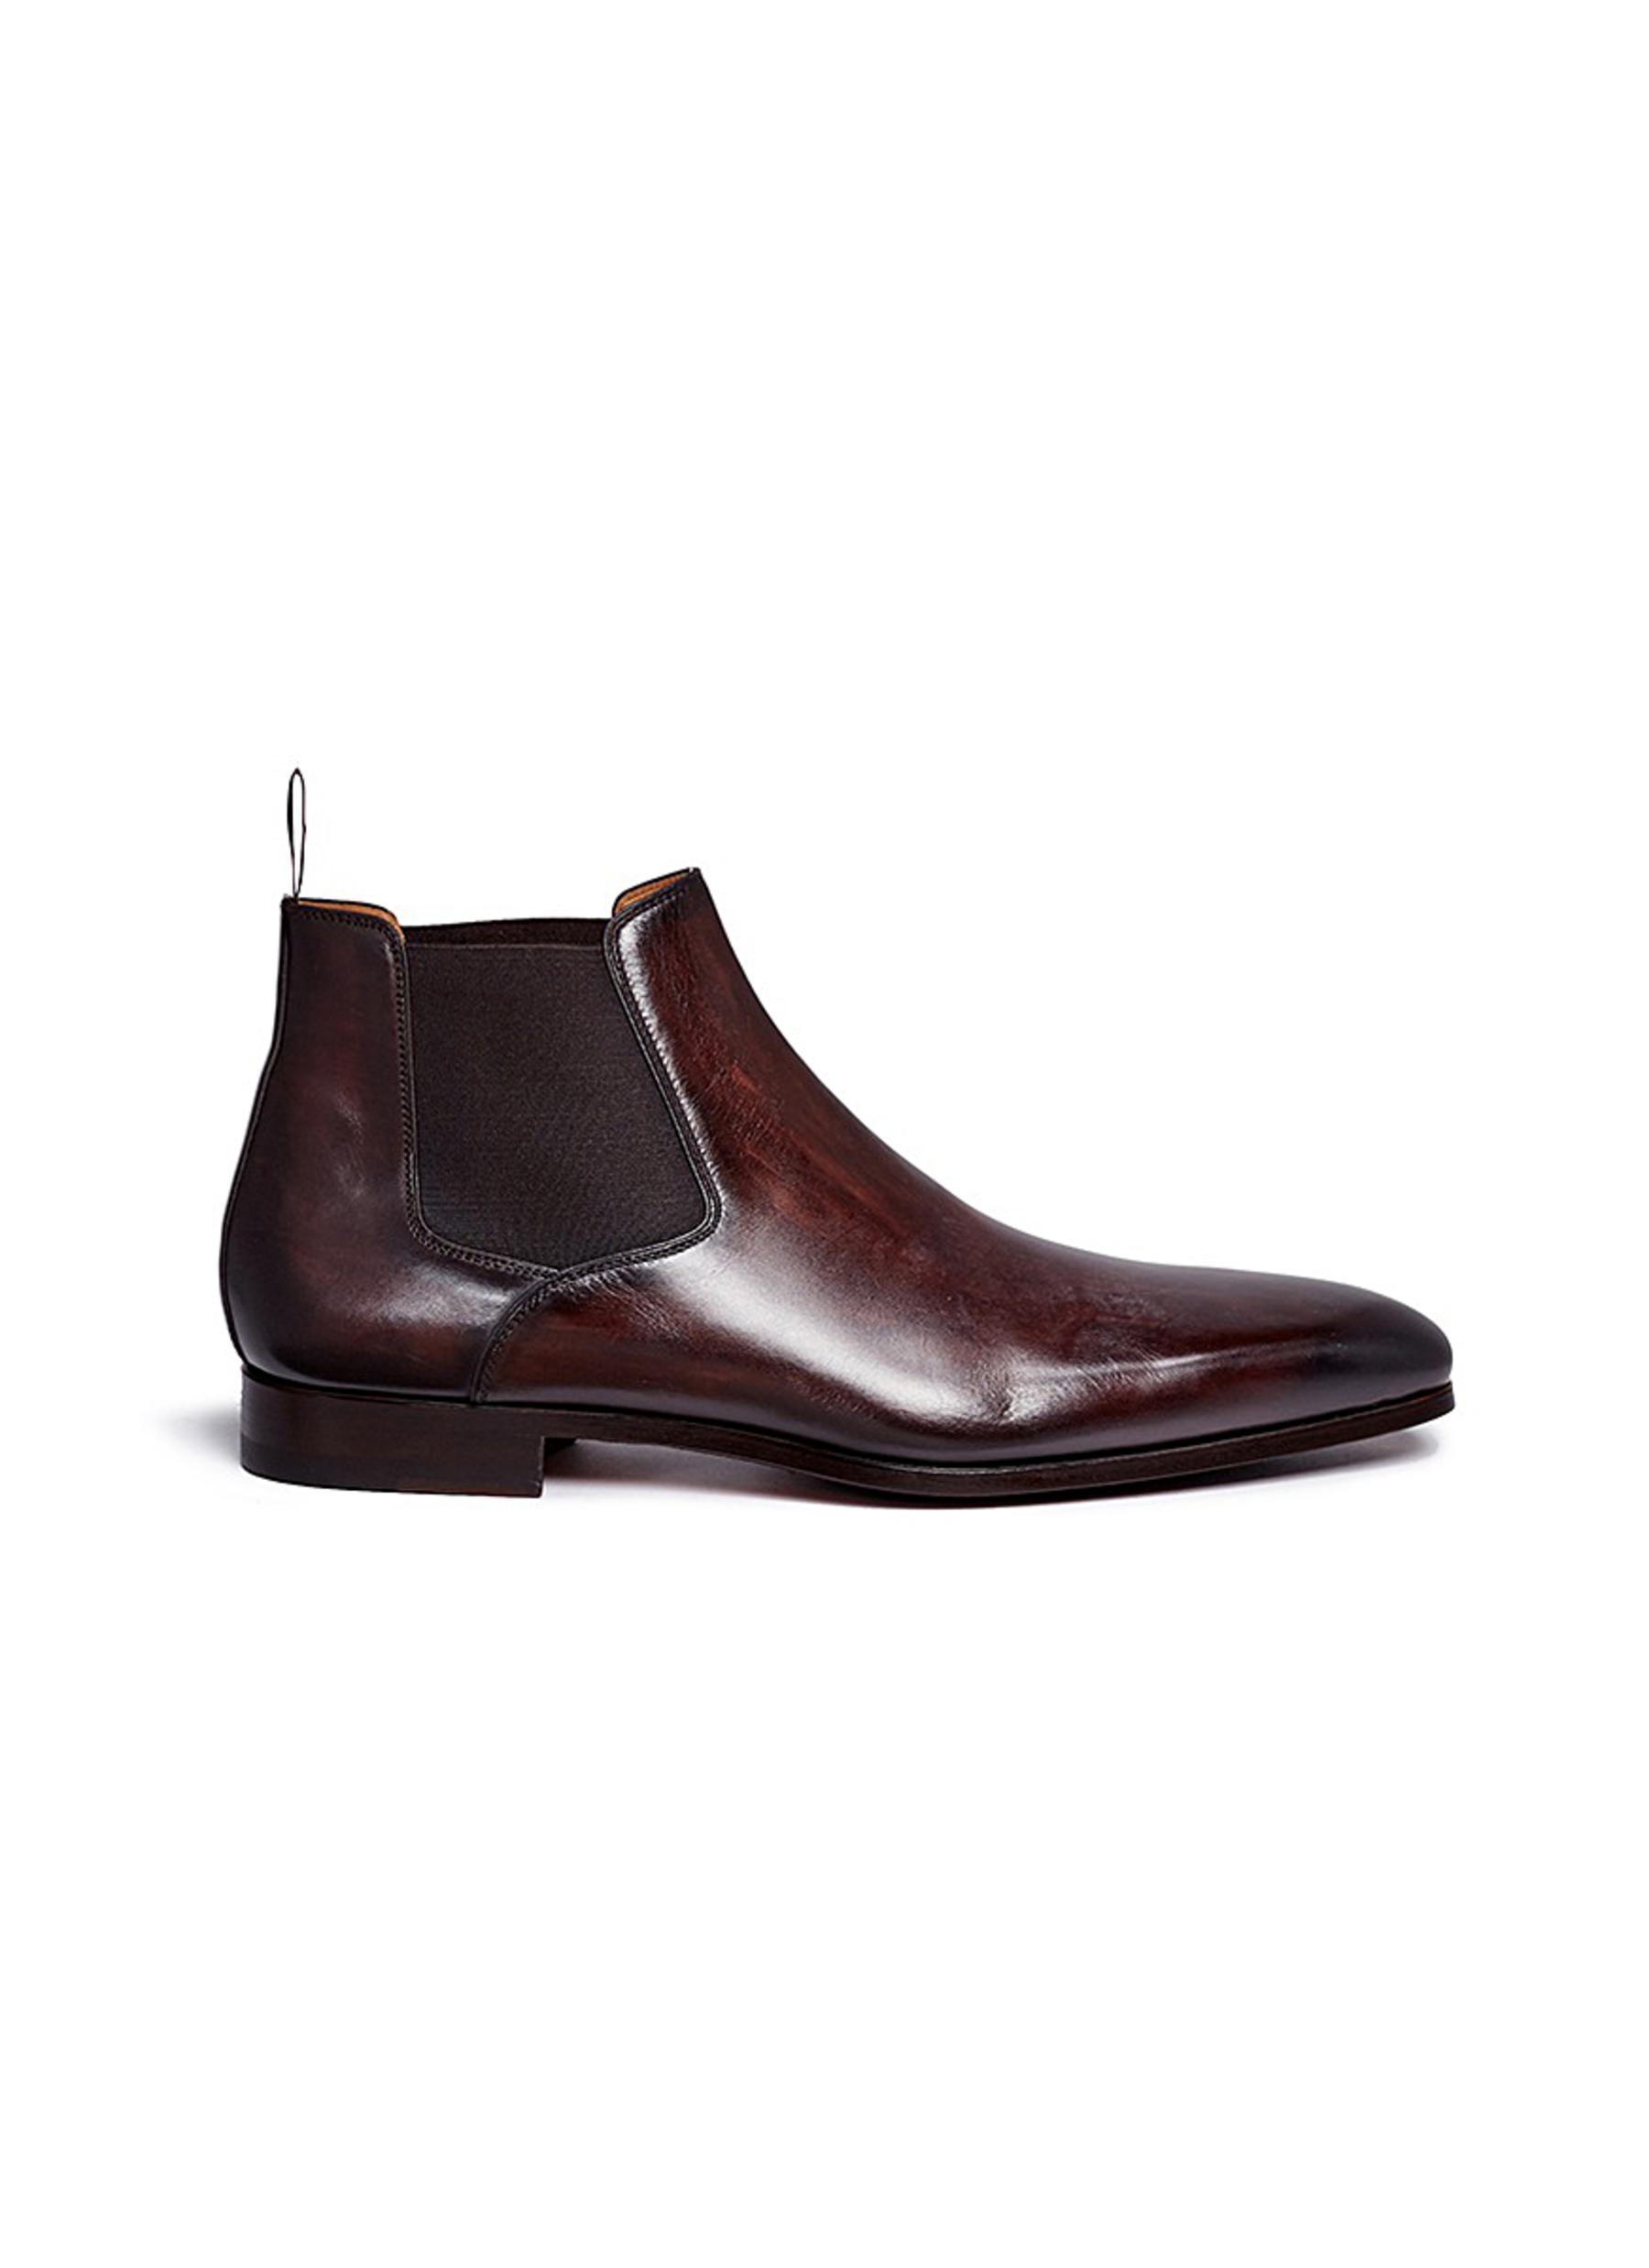 Leather Chelsea boots - MAGNANNI - Modalova